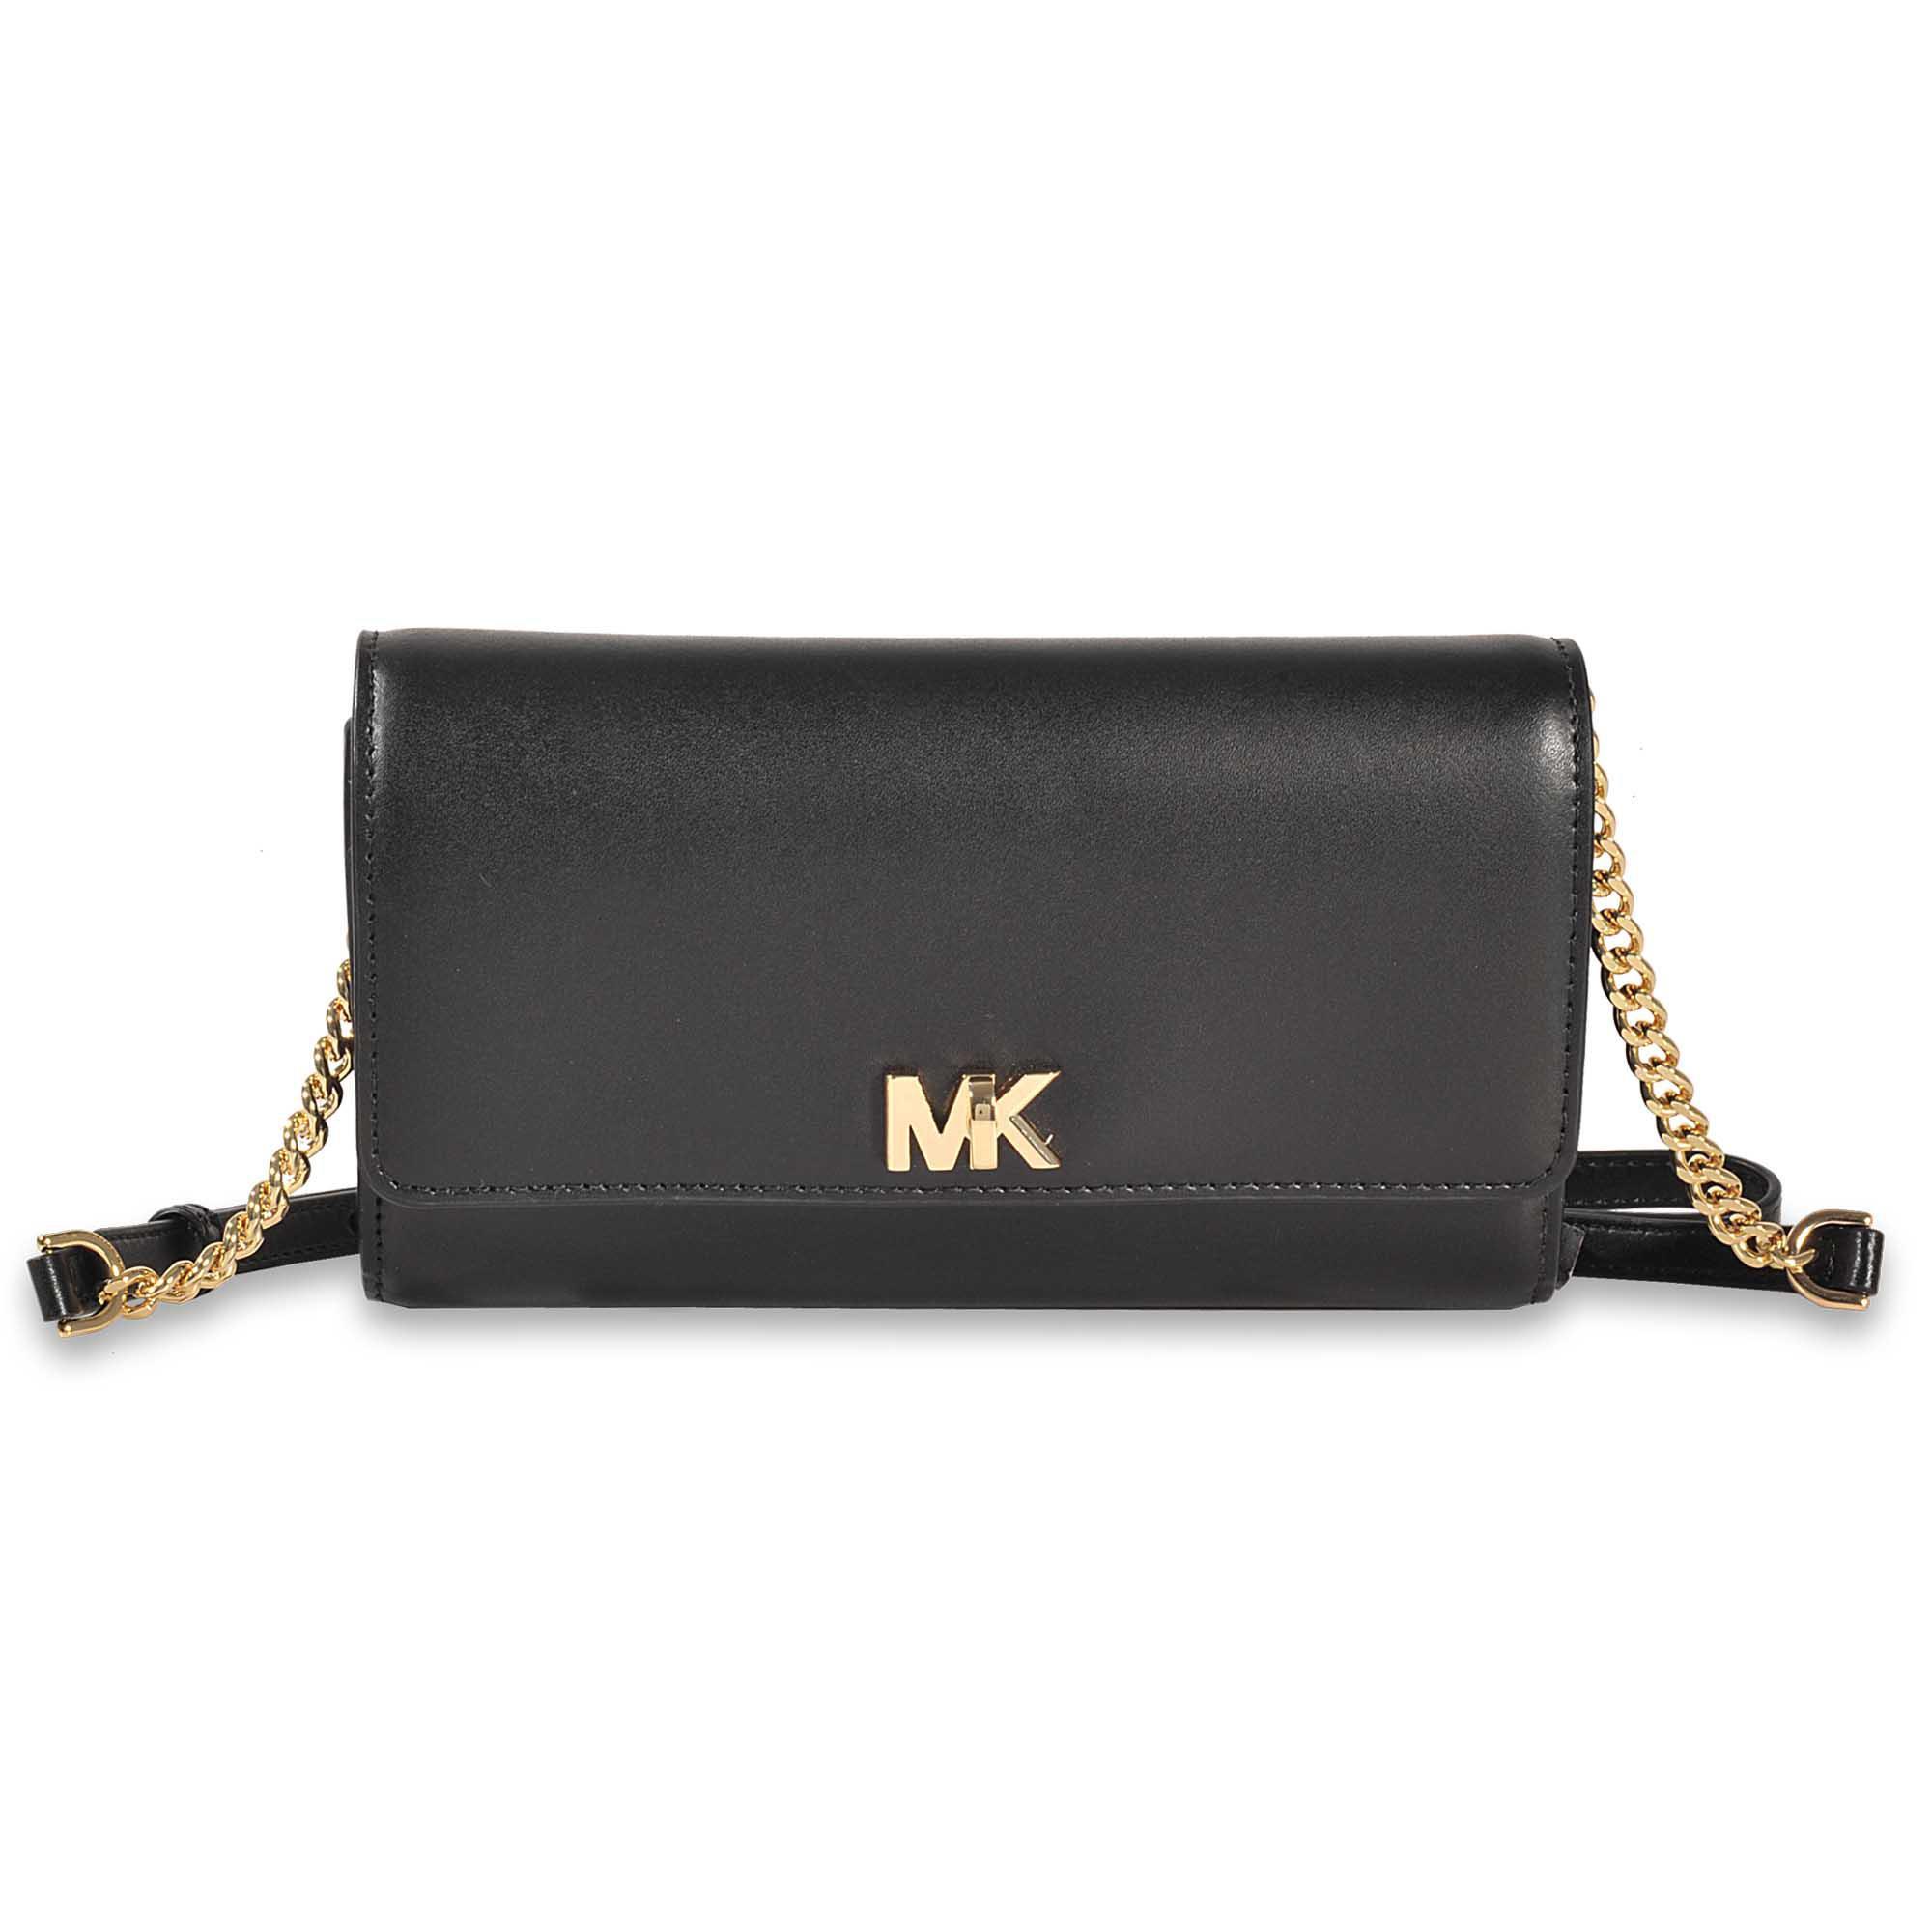 cc5a49d166a1 MICHAEL Michael Kors Mott Xl Wallet Clutch in Black - Lyst